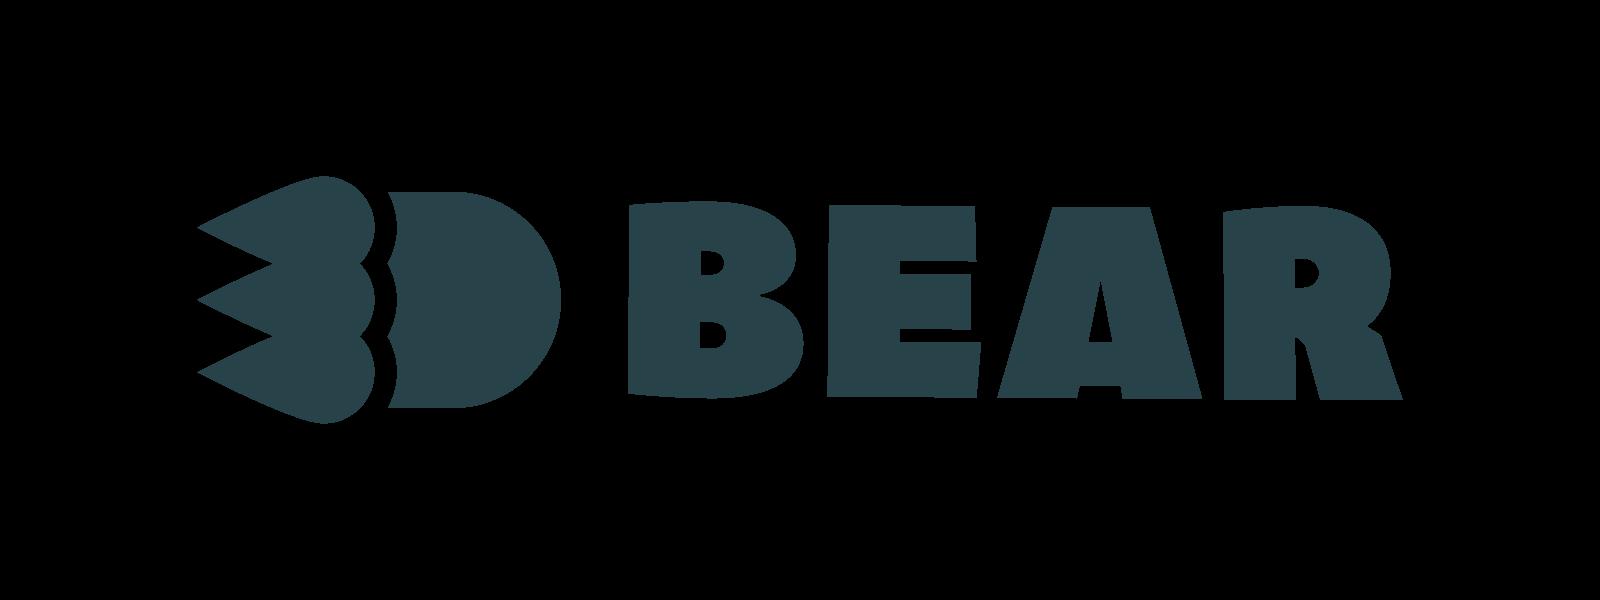 3DBear-logo1-teal